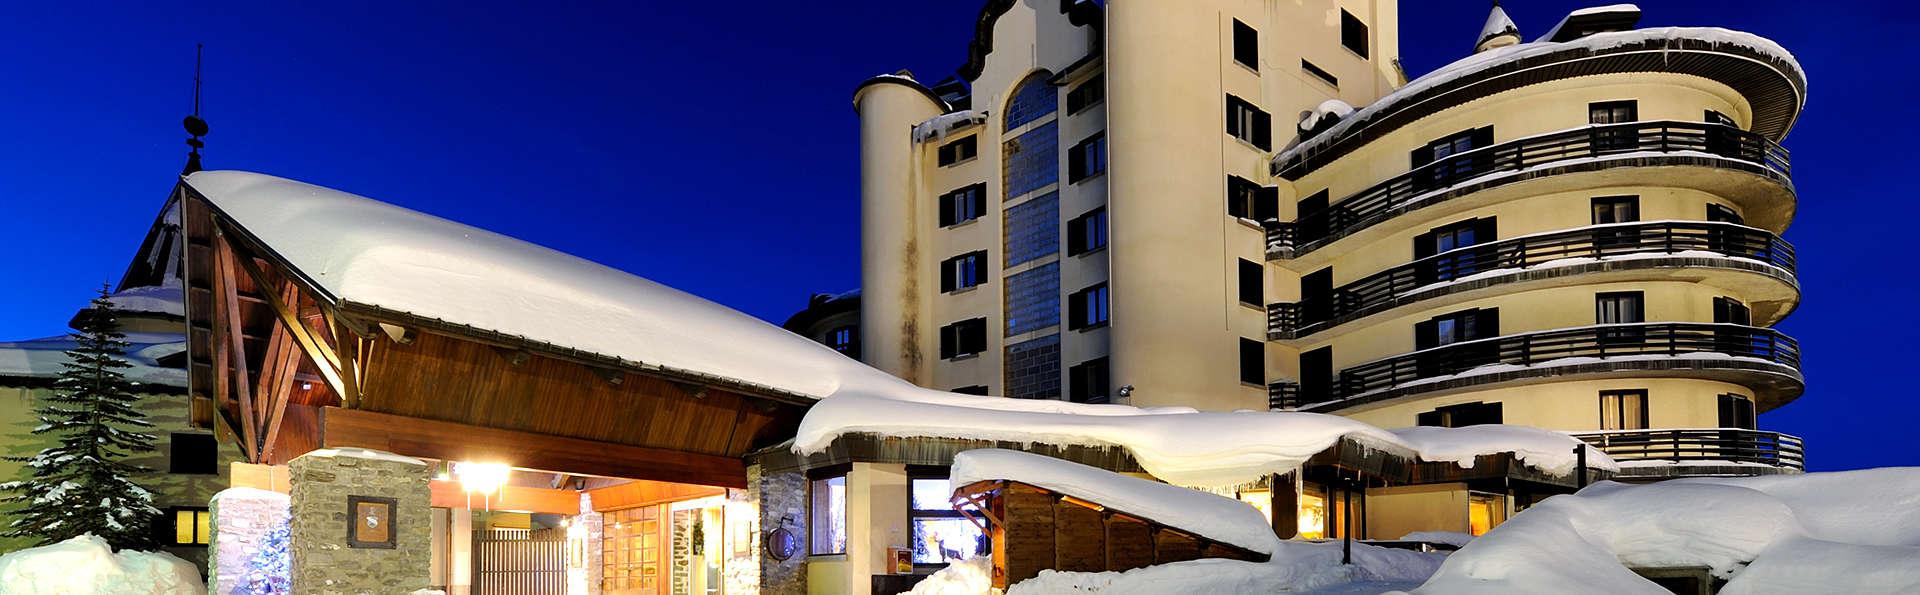 Hotel Principi di Piemonte - Edit_Front2.jpg